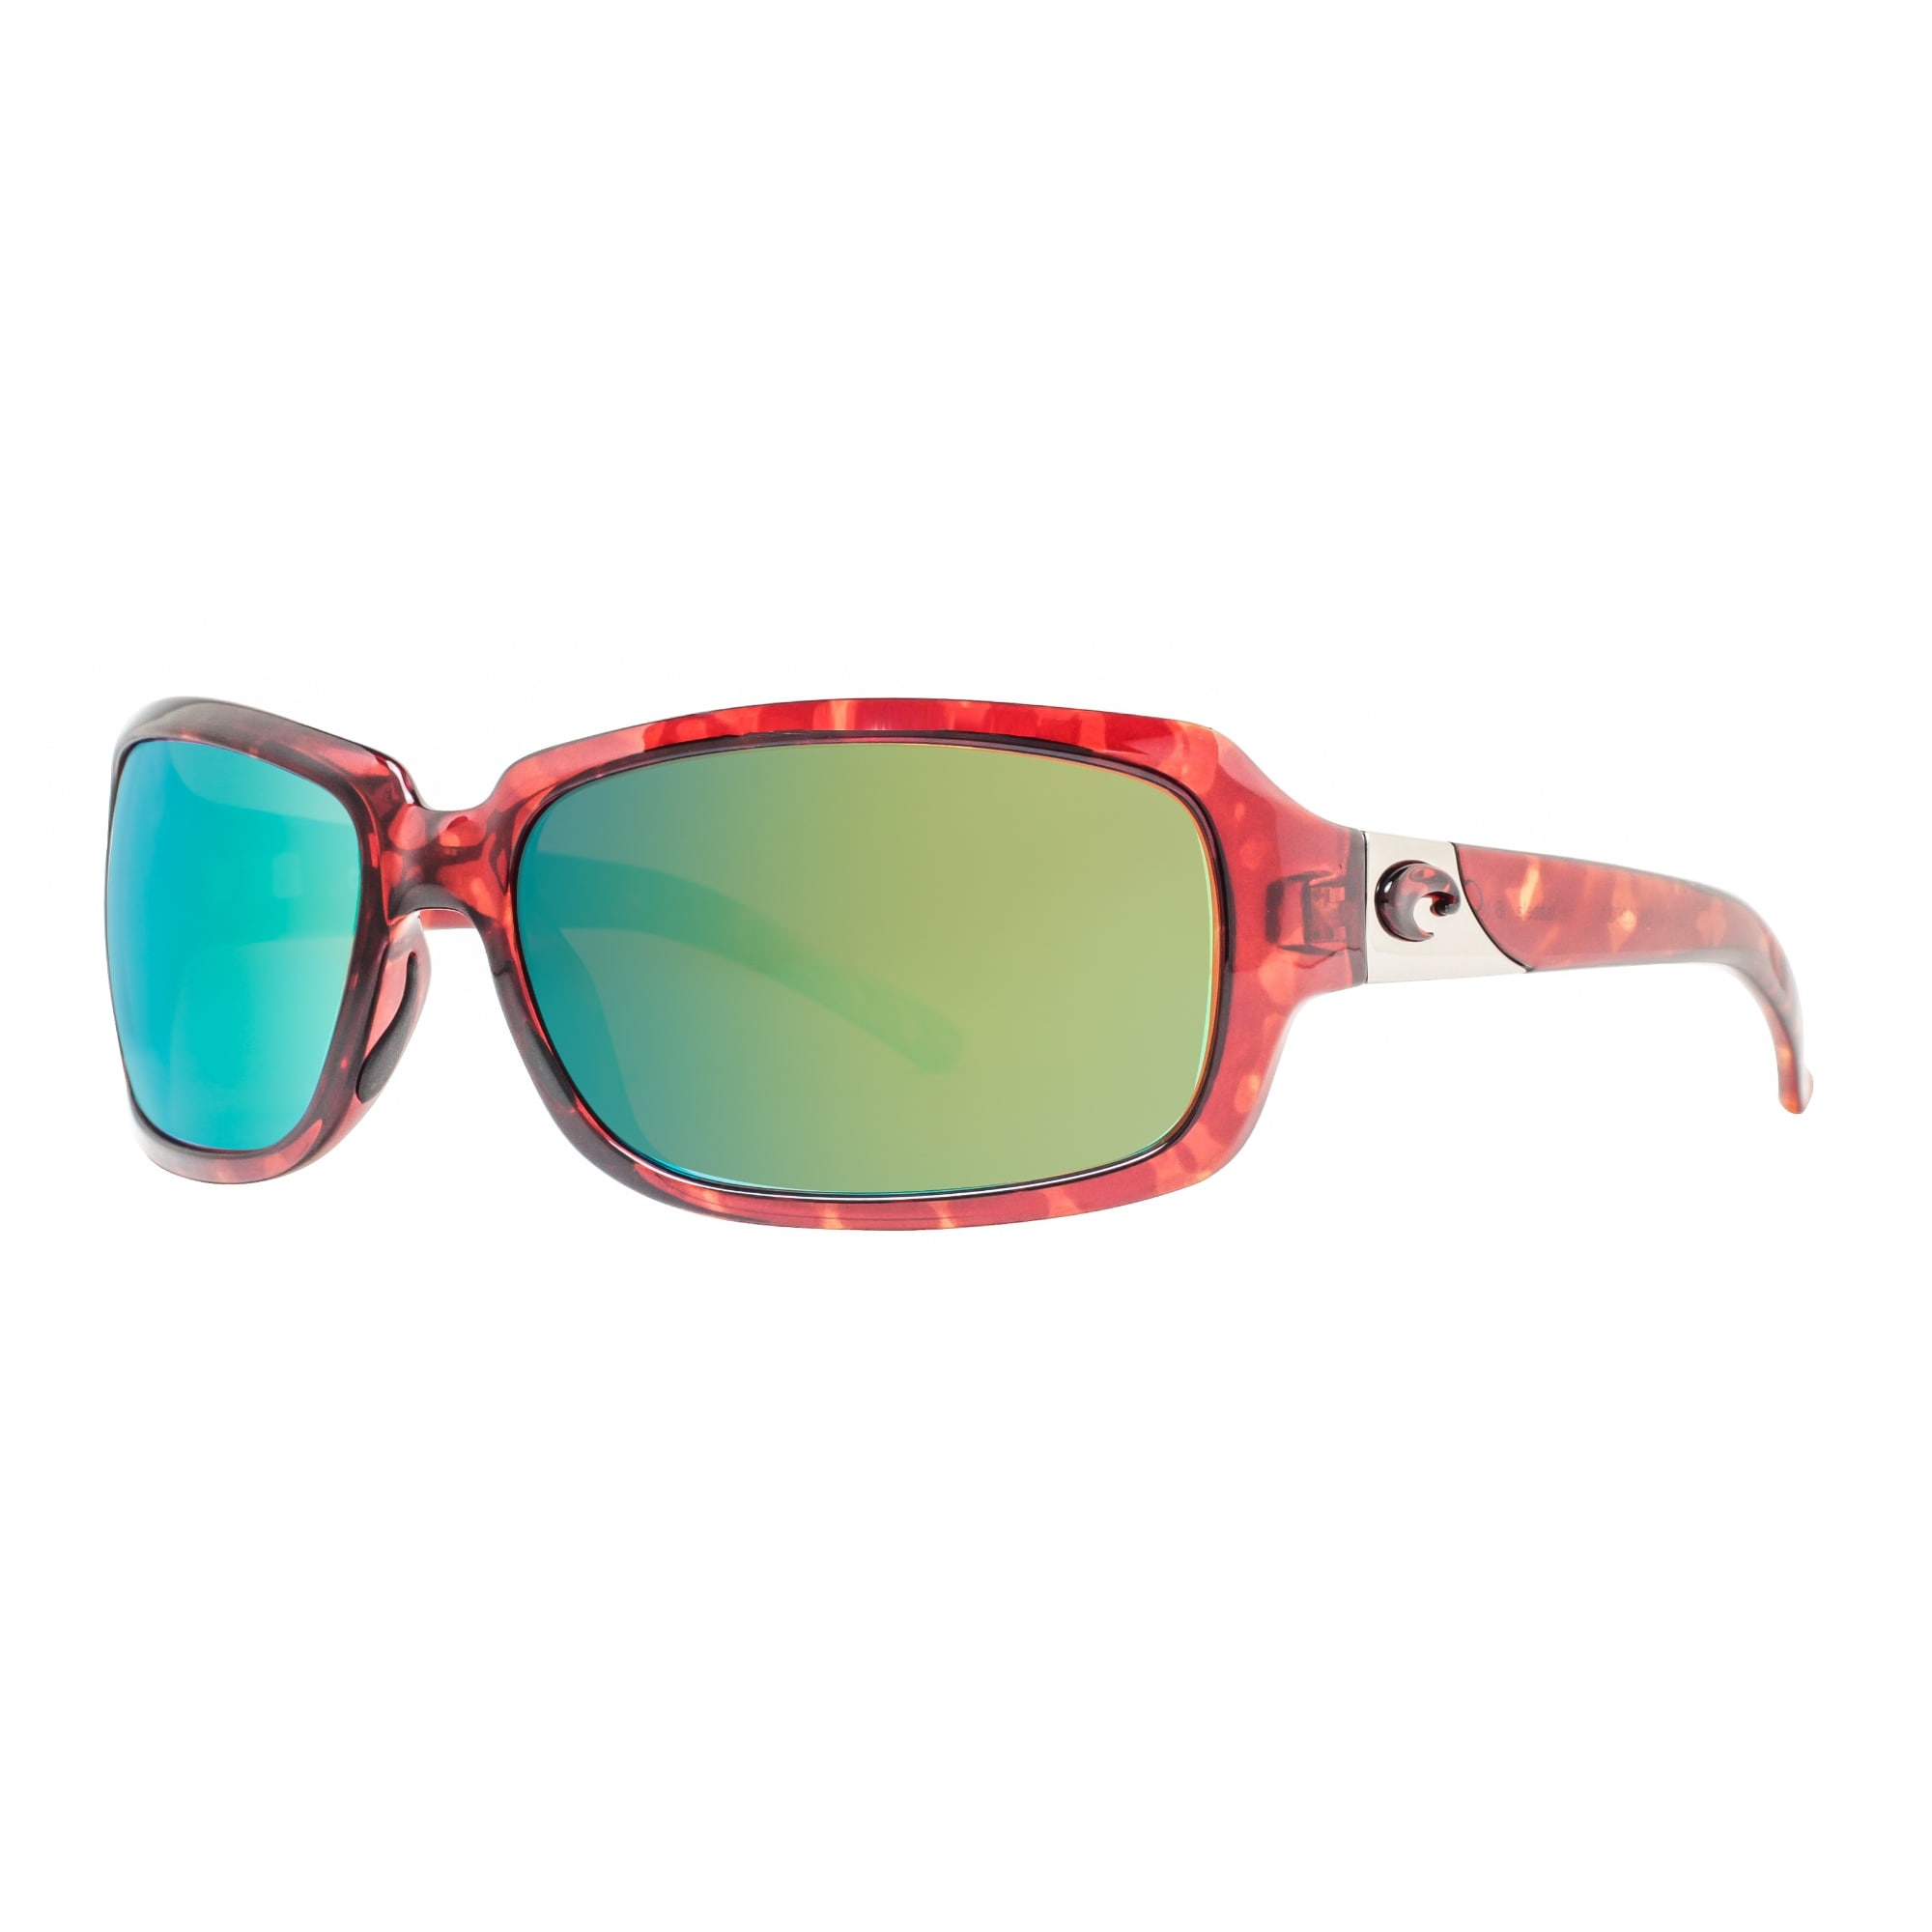 Costa Del Mar Isabela Sunglasses IB-10-OGMP TortoiseGreen 580P Polarized